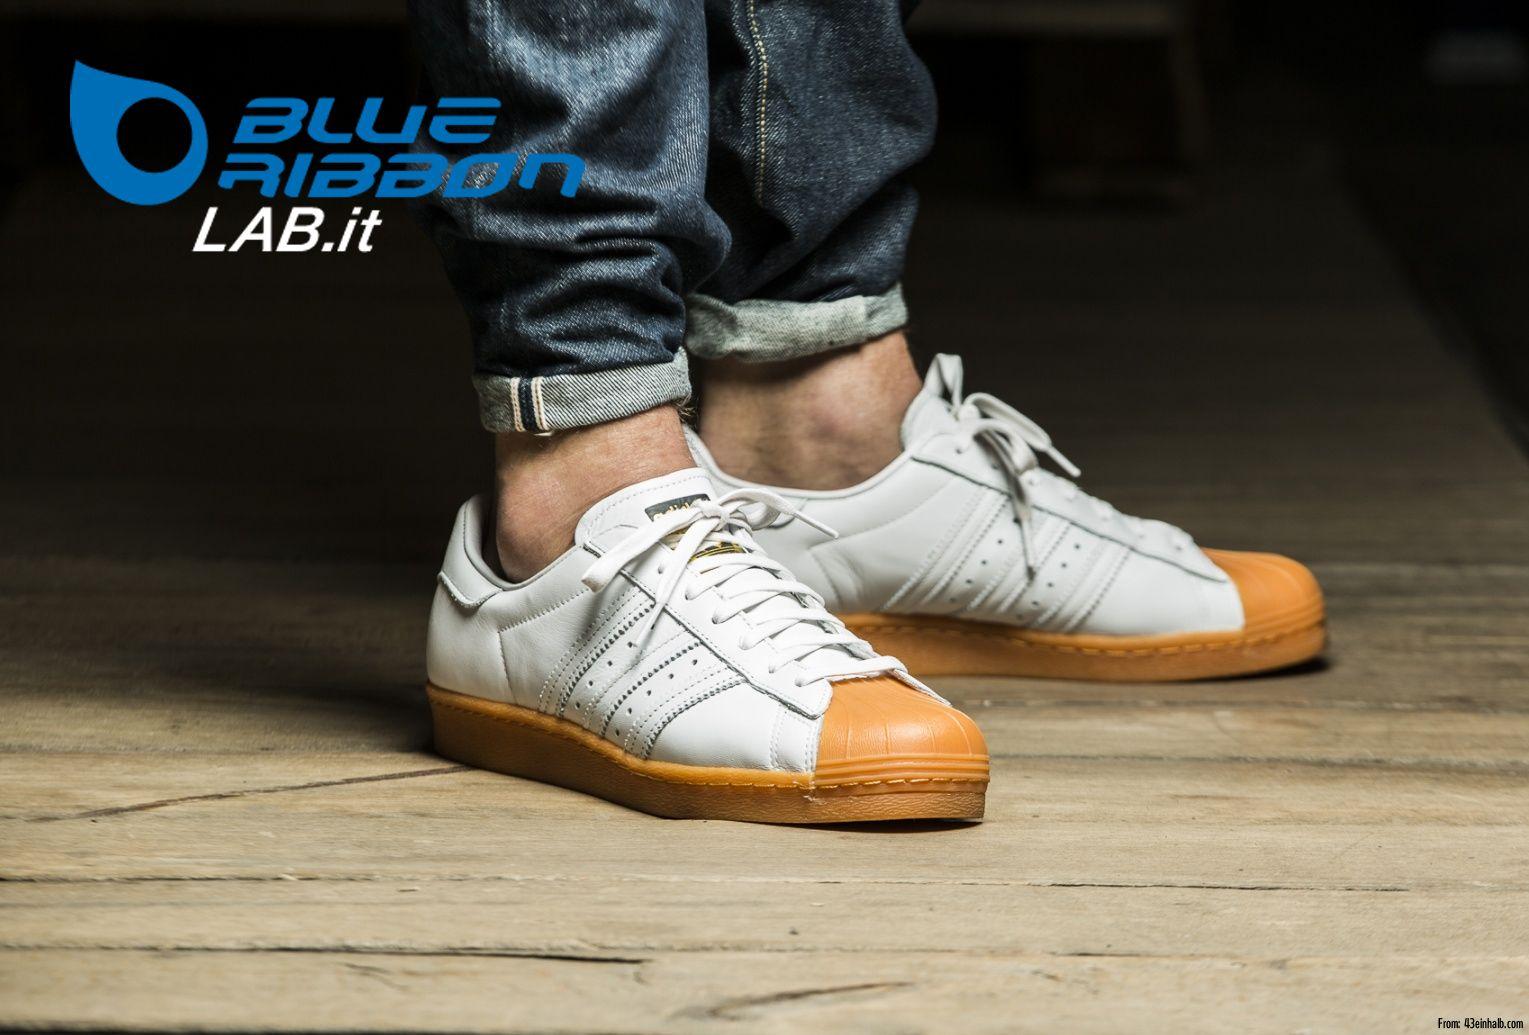 Adidas superstar degli anni '80 - adidas superstar pinterest adidas